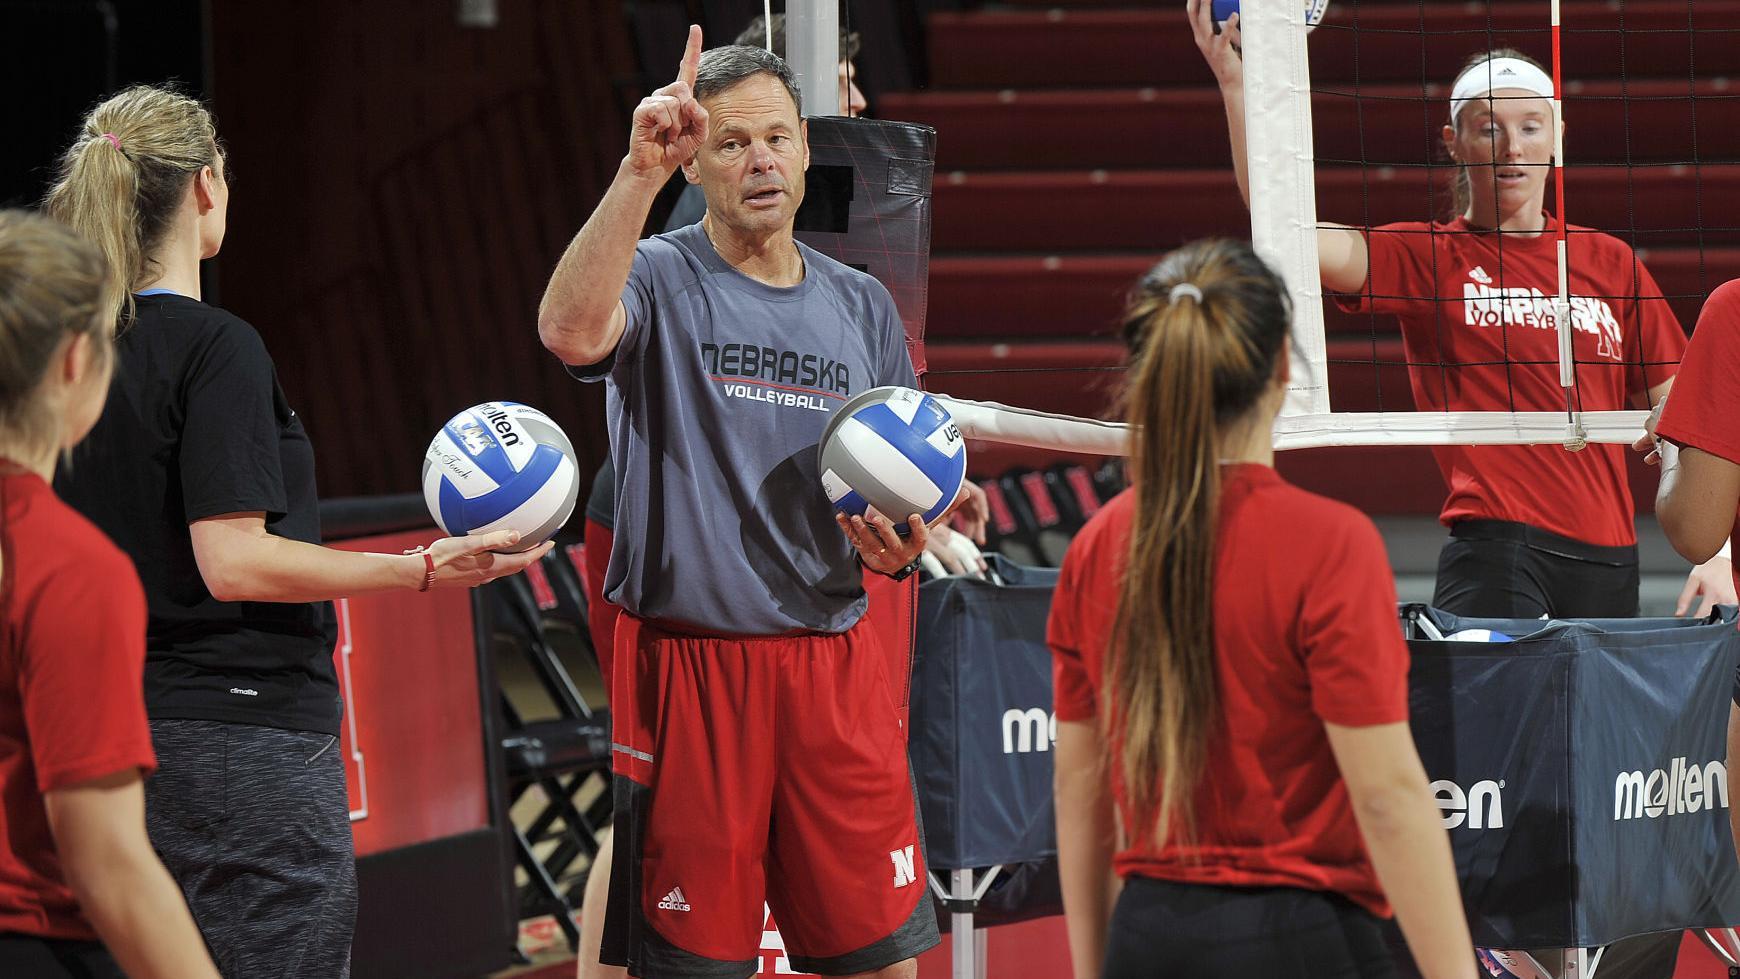 Six Nebraska Players Make All Region Team Cook Named